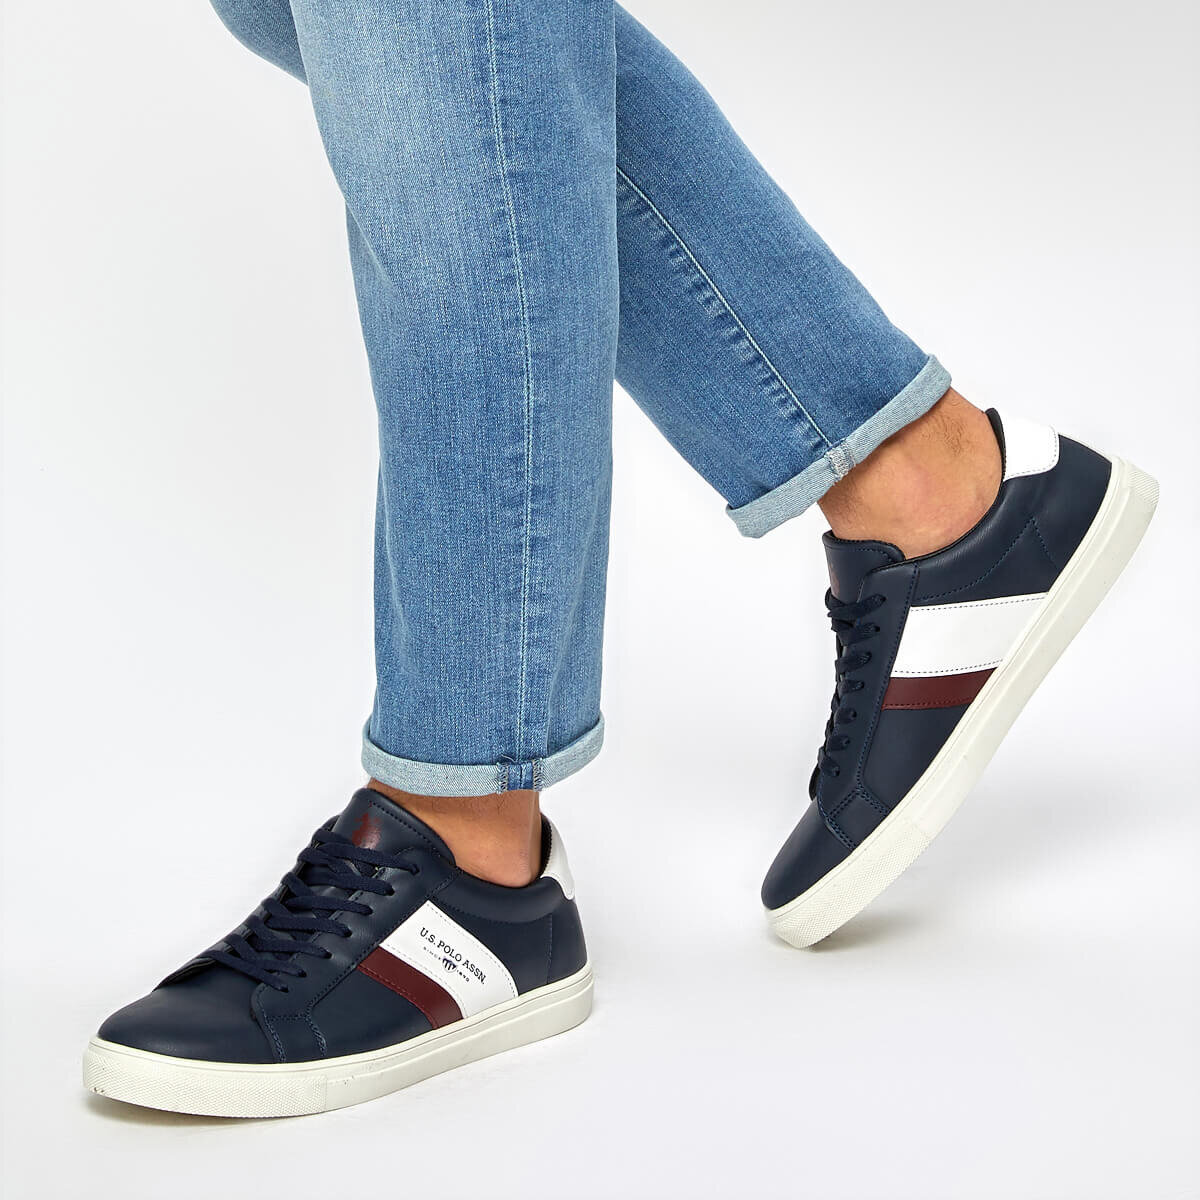 FLO ANTON WT 9PR Navy Blue Men 'S Sneaker Shoes U.S. POLO ASSN.